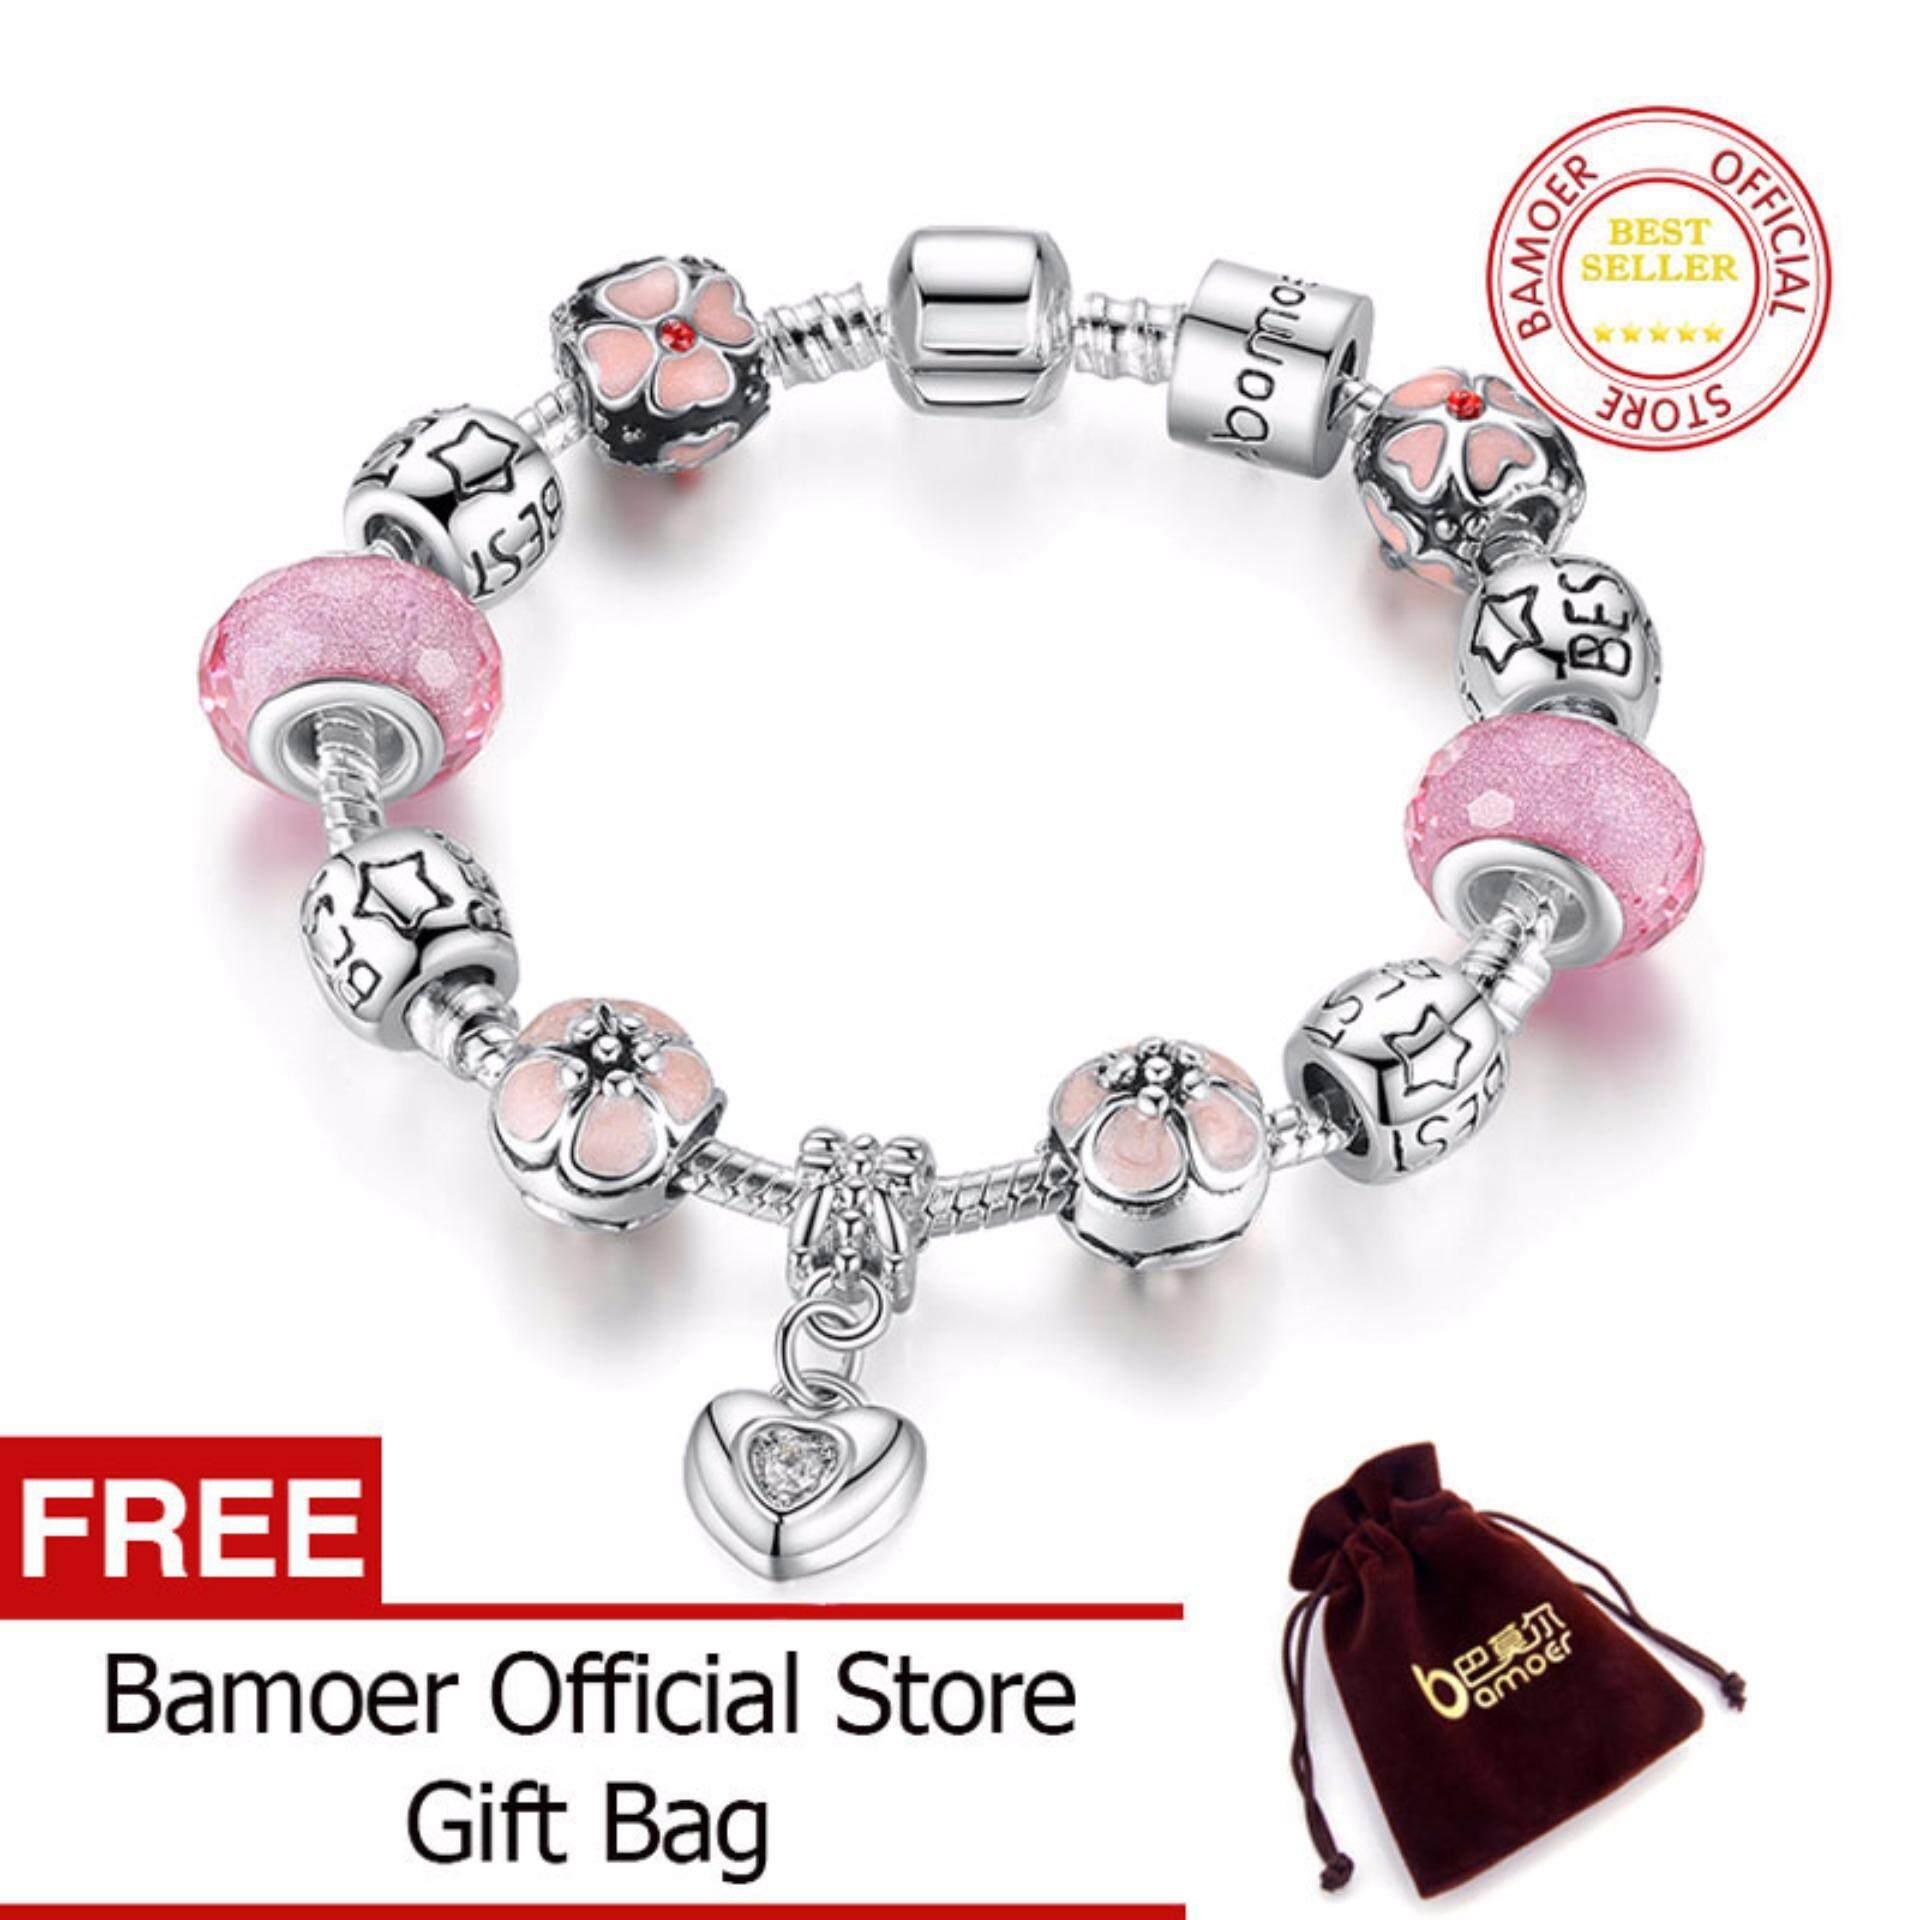 Perbandingan Harga Bamoer 925 Silver Charm 20Cm Bracelet With Heart Pendant Cherry Blossom Charm Pink Murano Glass Beads Friendship Bracelet Pa1459 Di Tiongkok